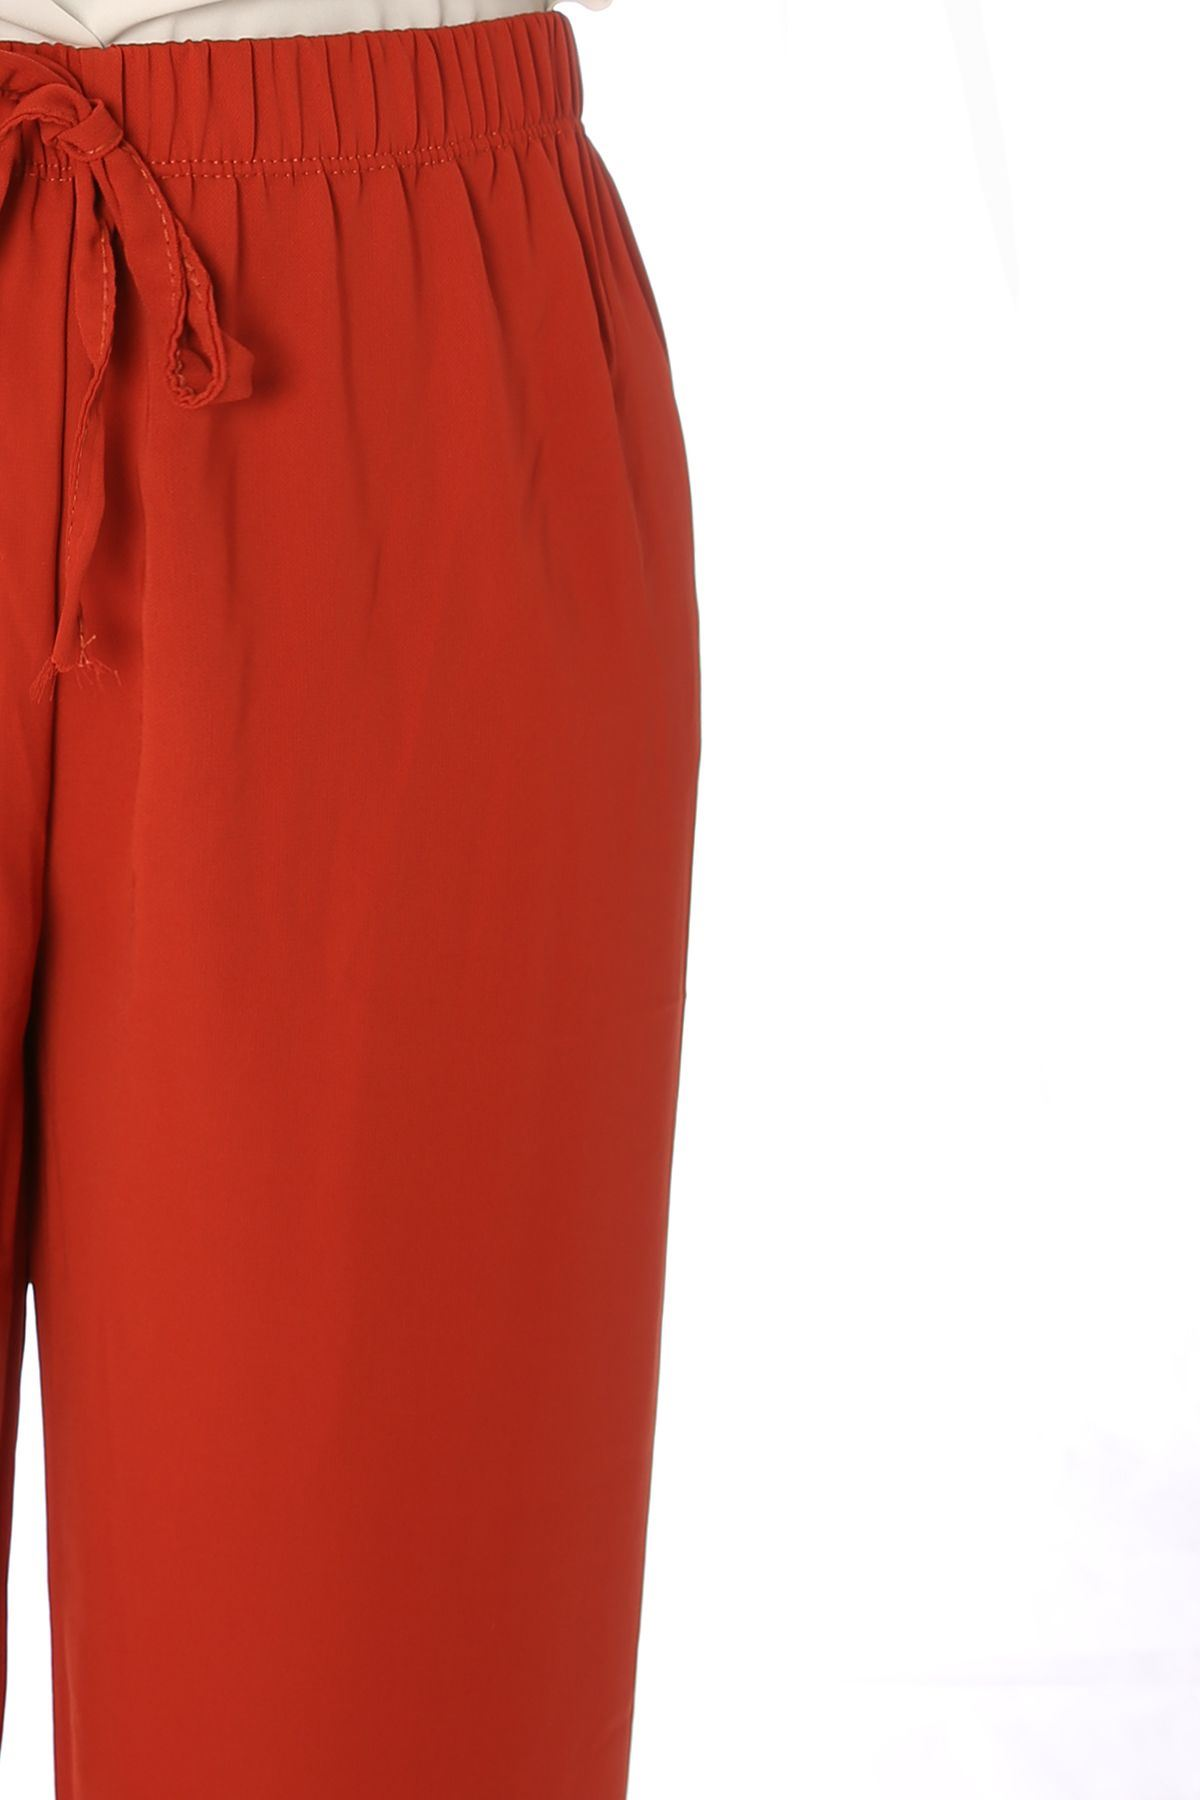 Bel Lastikli Salaş Pantolon-Kiremit